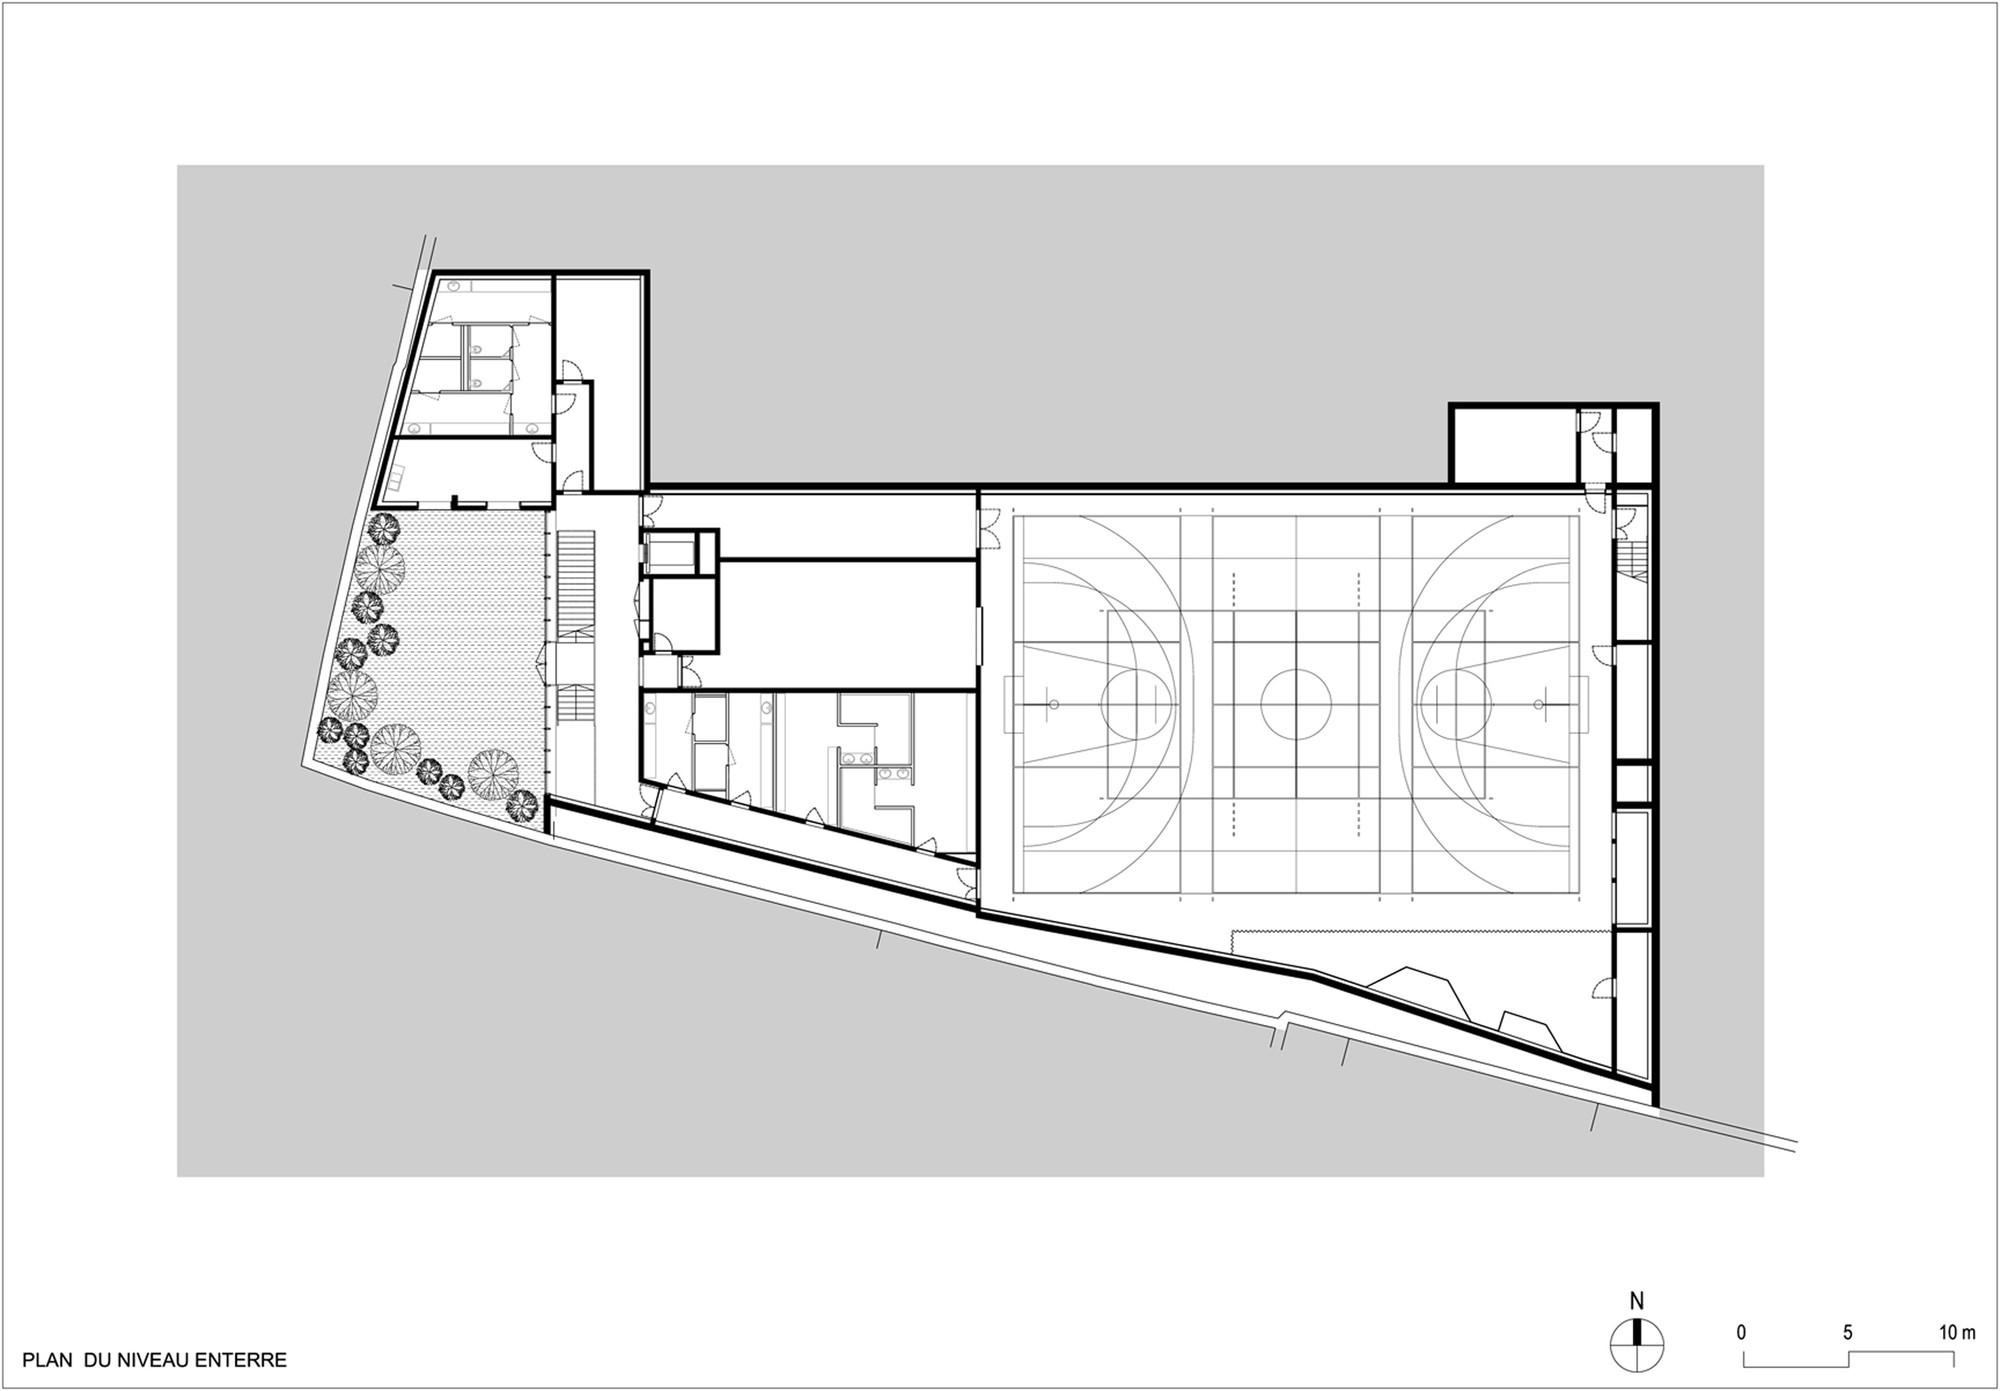 Unique Basement Floor Plan